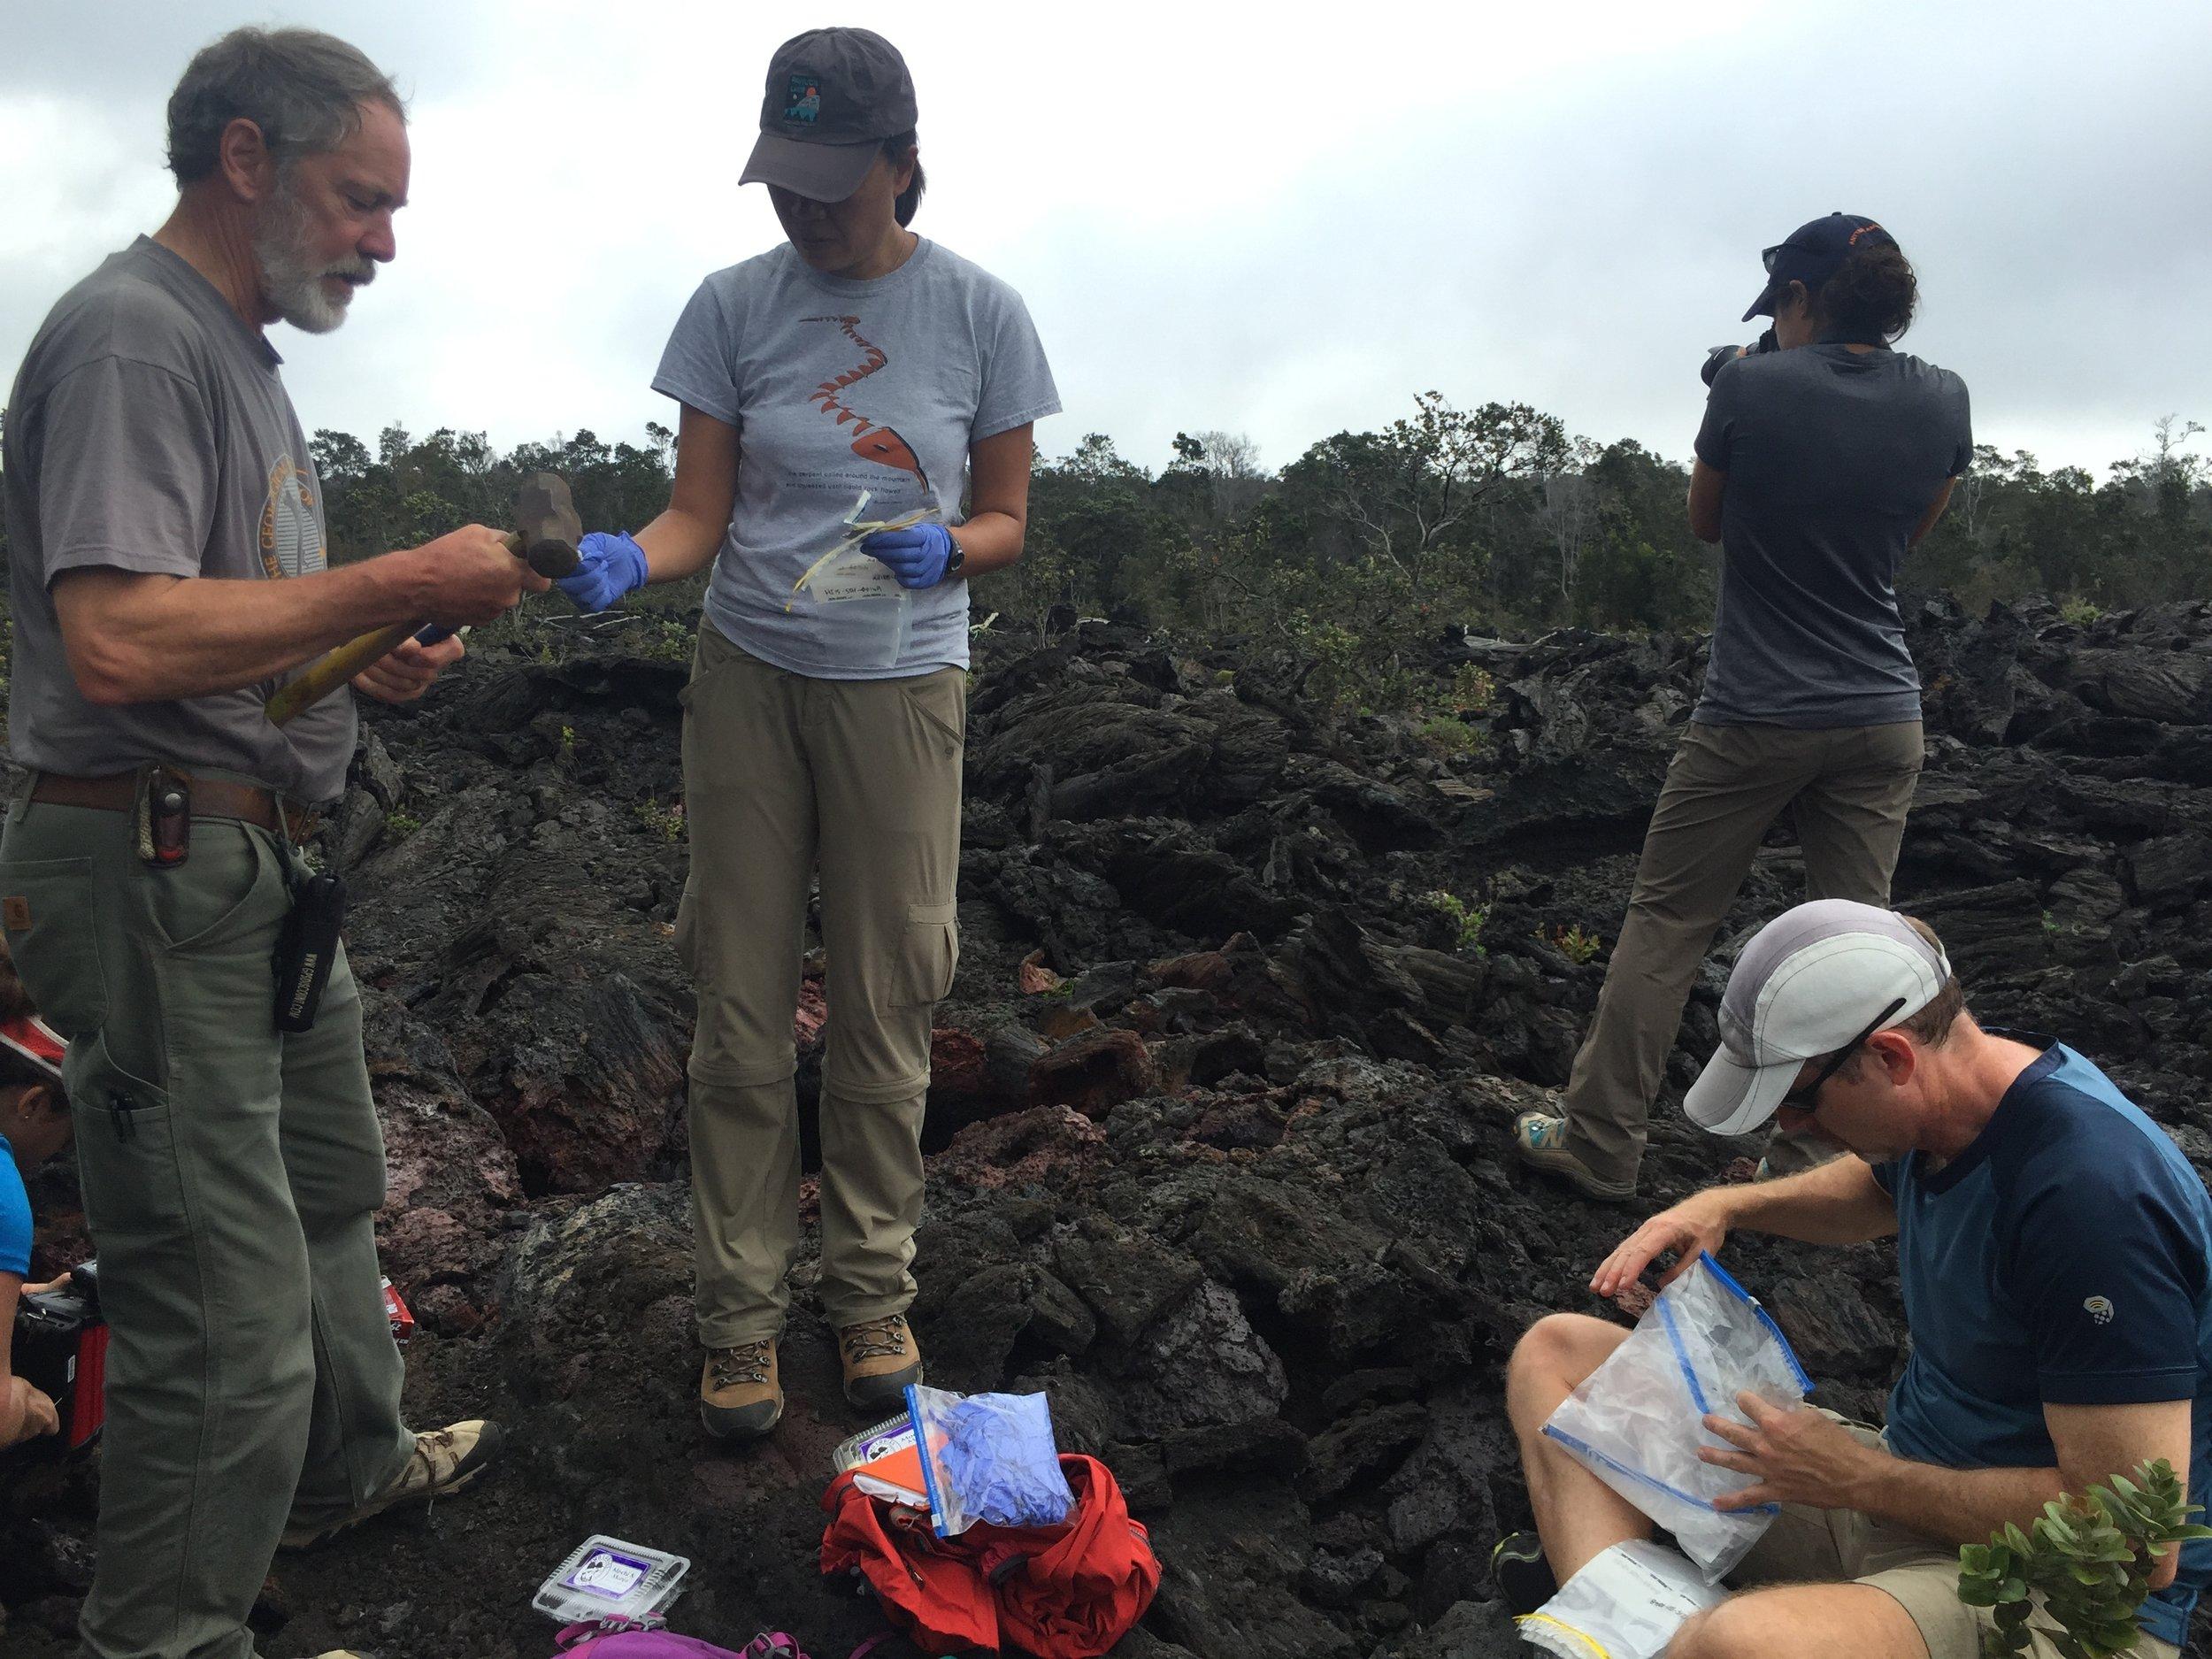 Field sampling in Mauna Ulu region of Hawai'i with Scott Hughes, Kara Beaton and Steve Chappell